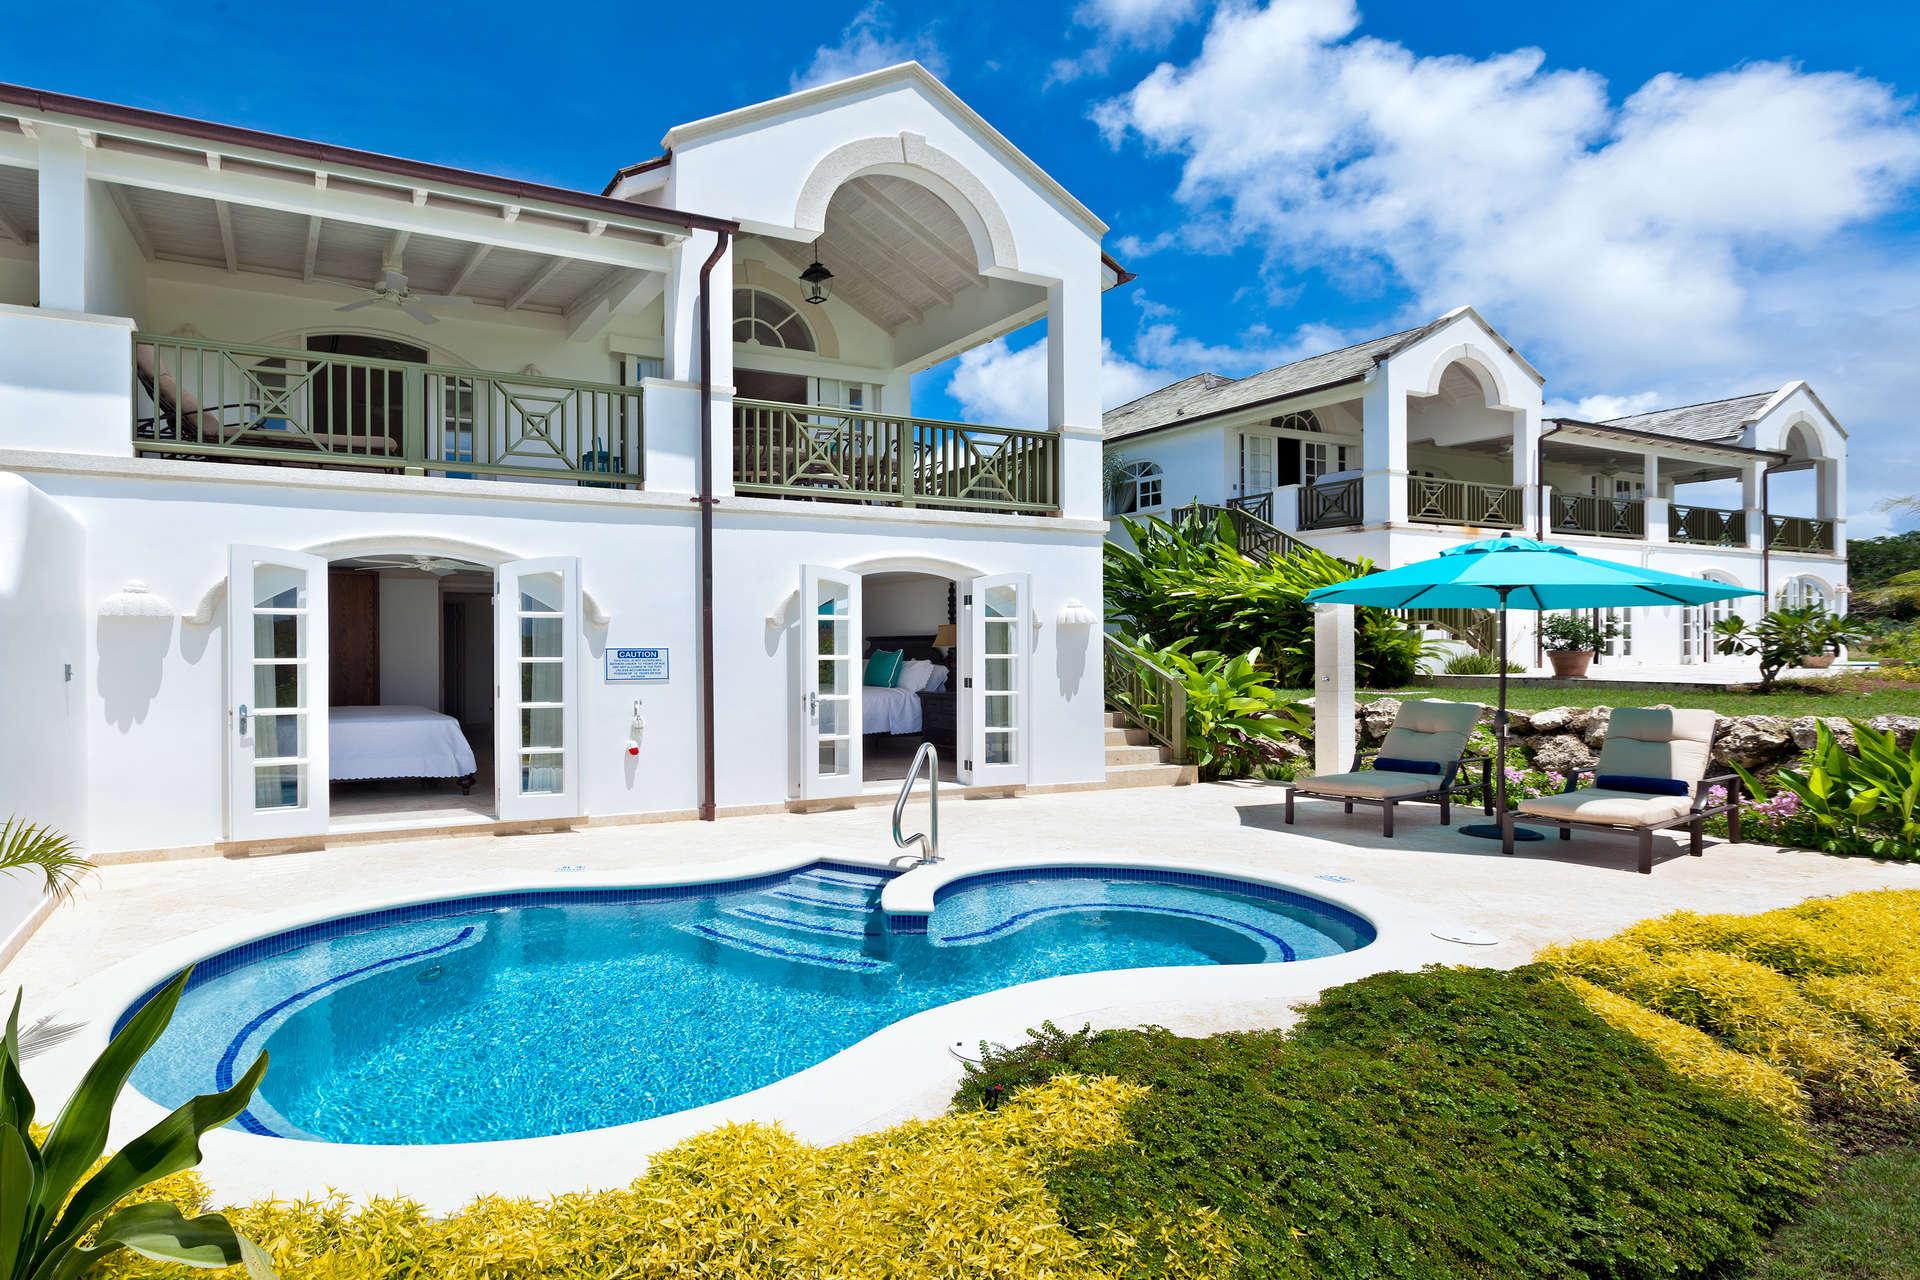 Luxury villa rentals caribbean - Barbados - St james - Royal westmoreland golf resort - Cherry Red - Image 1/12